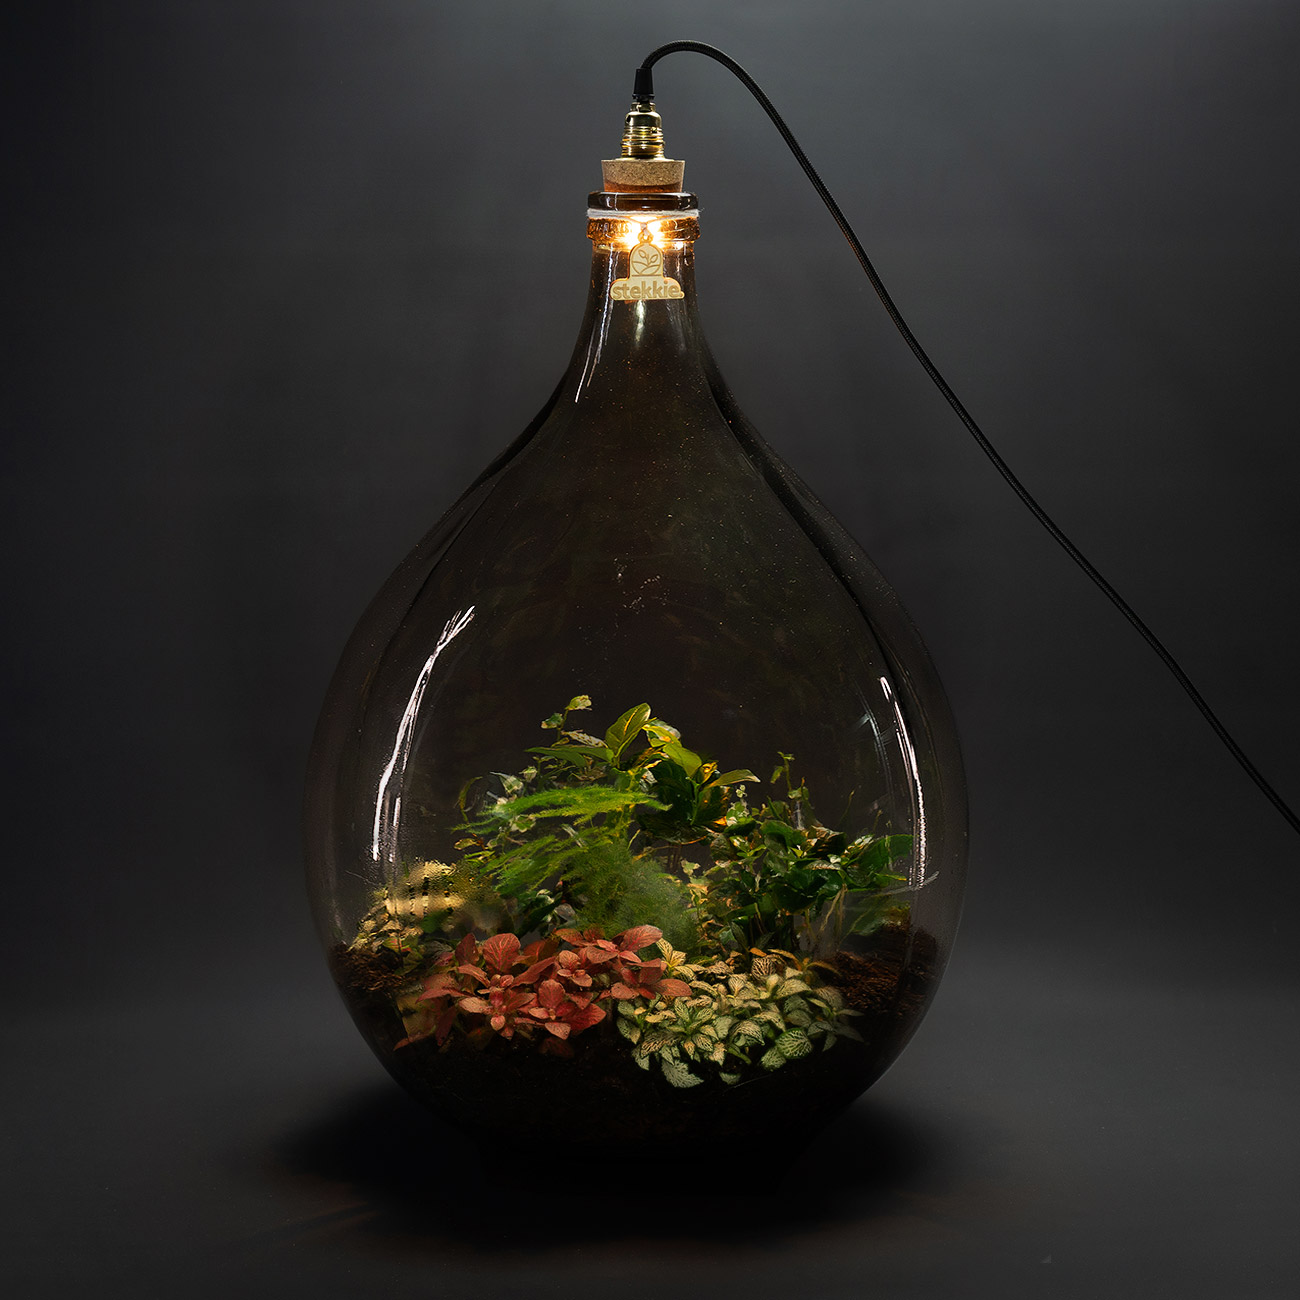 stekkie-extra-large-mini-ecosysteem-lamp-donker